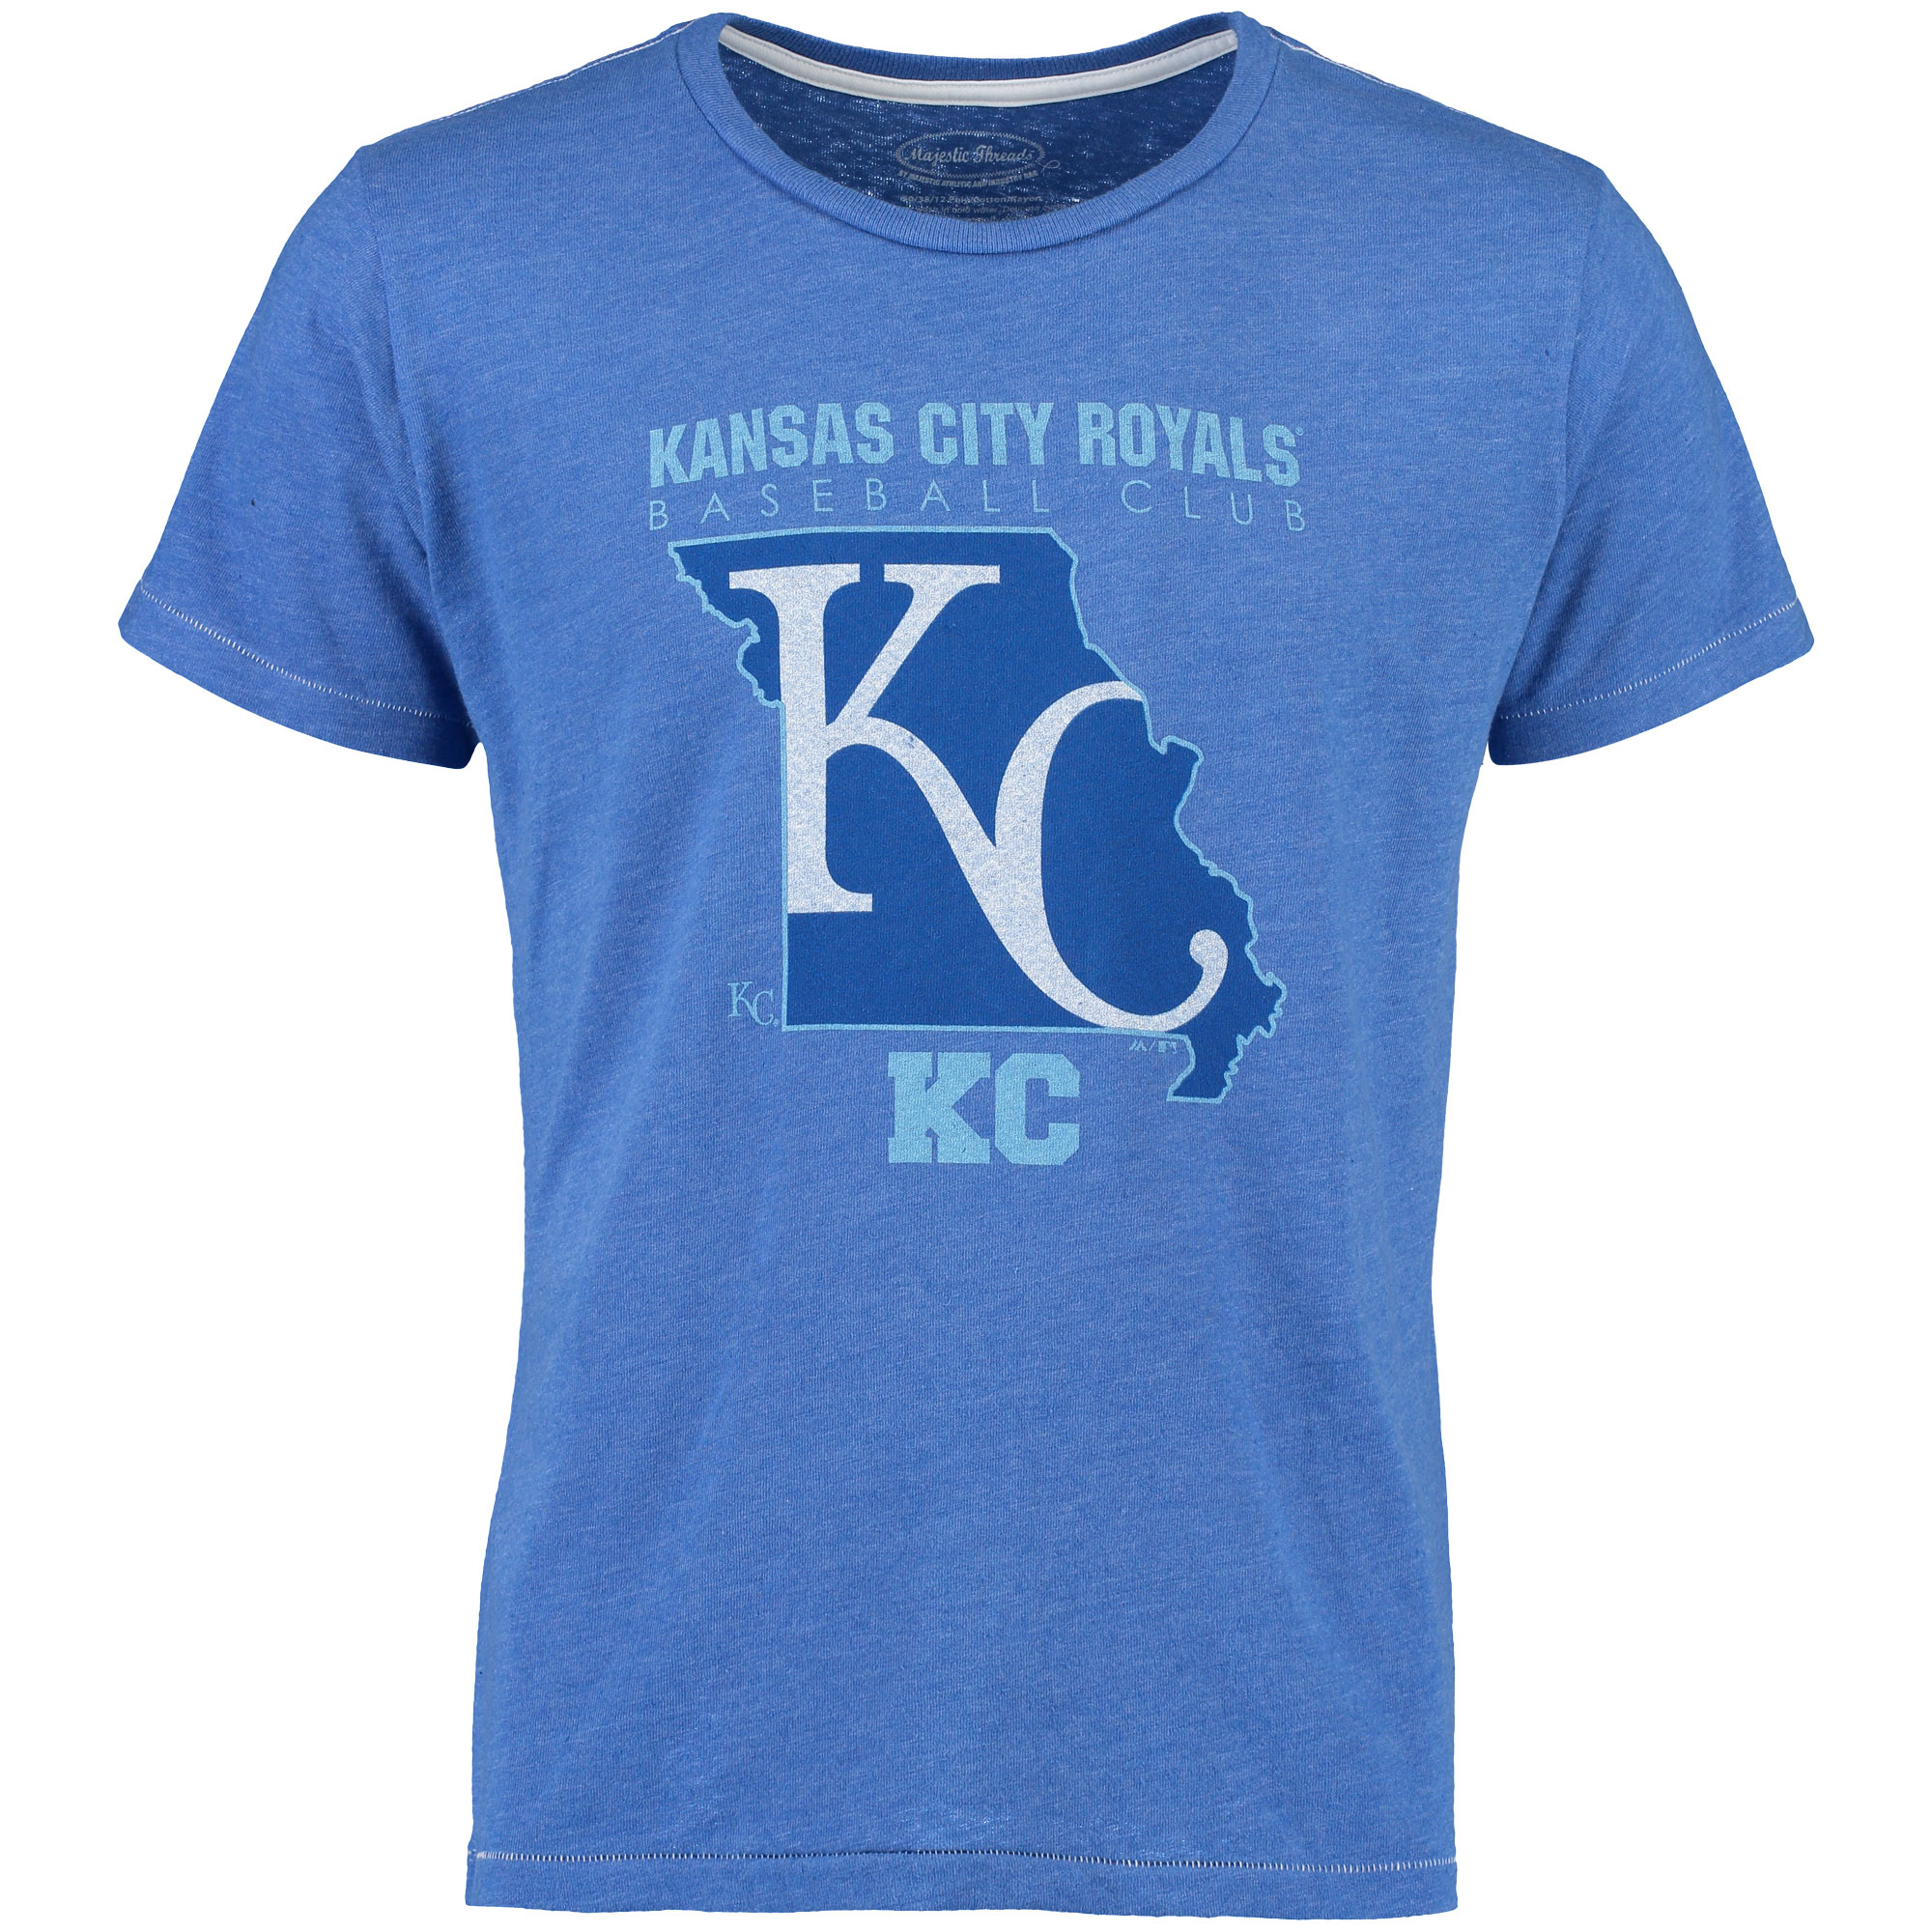 Kansas City Royals Majestic Threads State Sport Tri-Blend Contrast Stitch T-Shirt - Royal